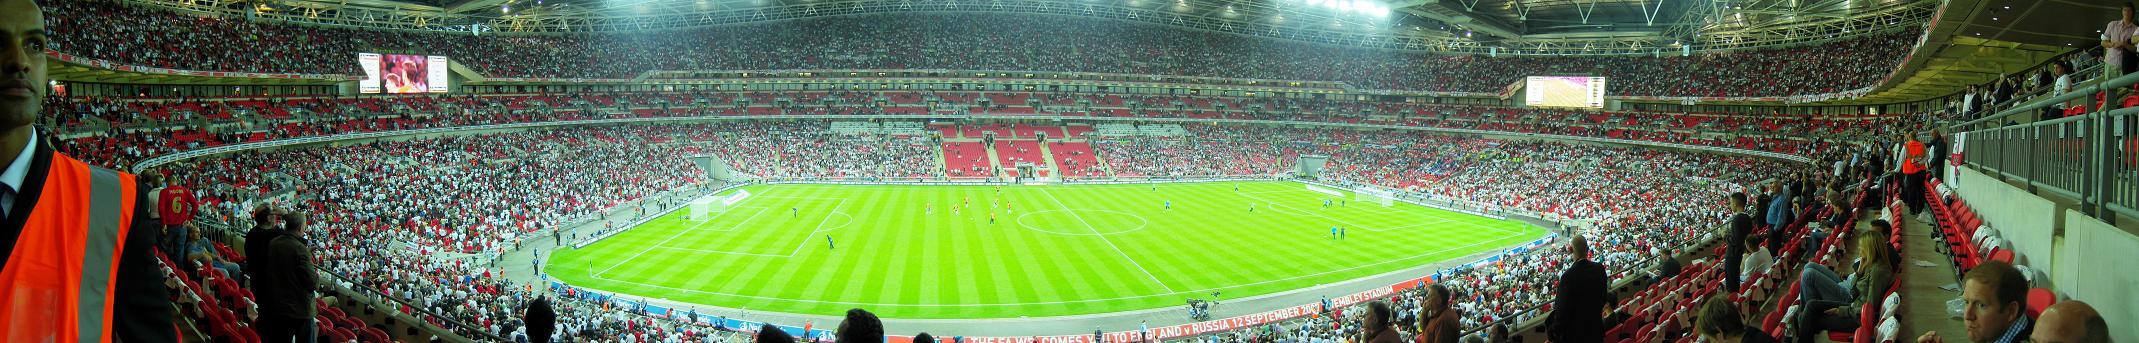 Панорама внутри стадиона Уэмбли